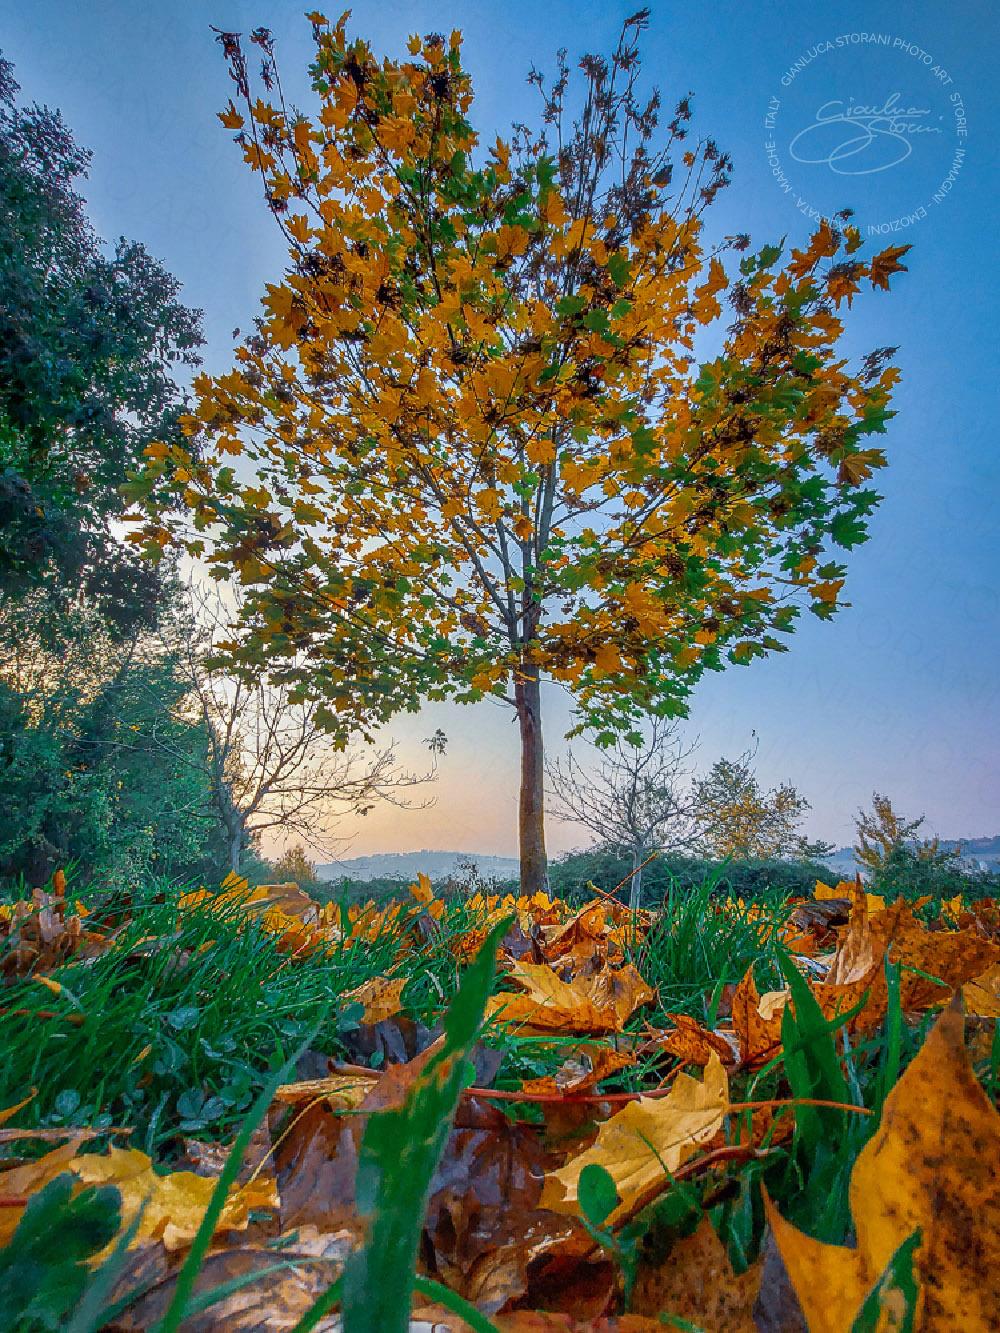 Tra le foglie d'autunno cadute in terra